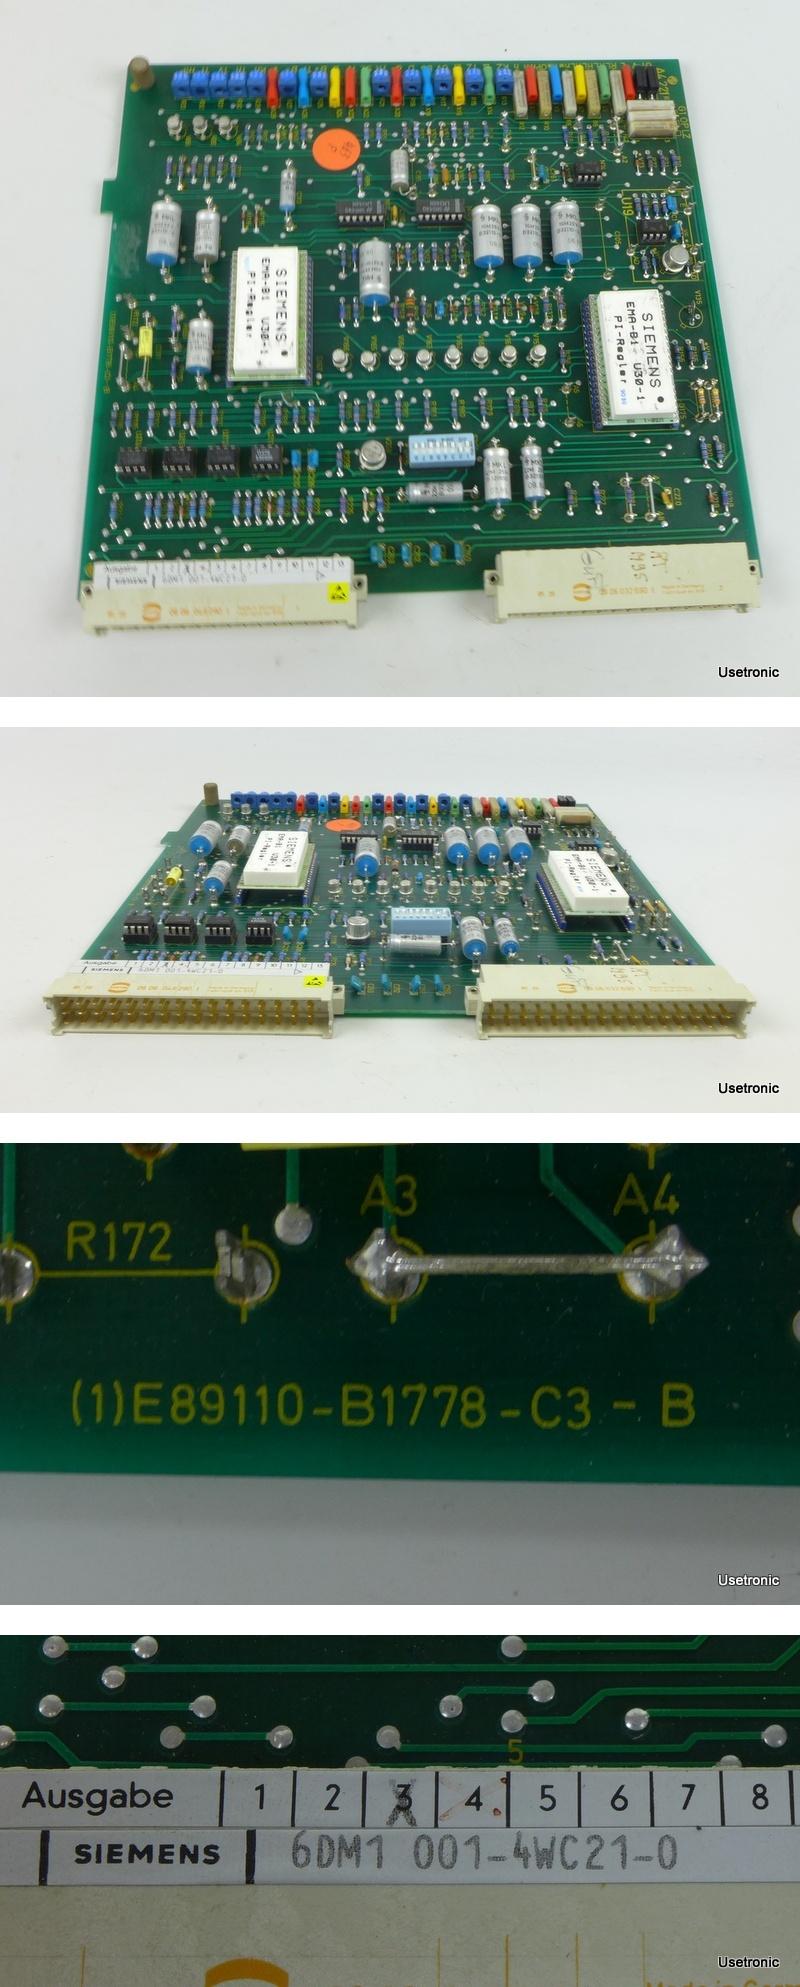 Siemens 6DM1001-4WC21-0